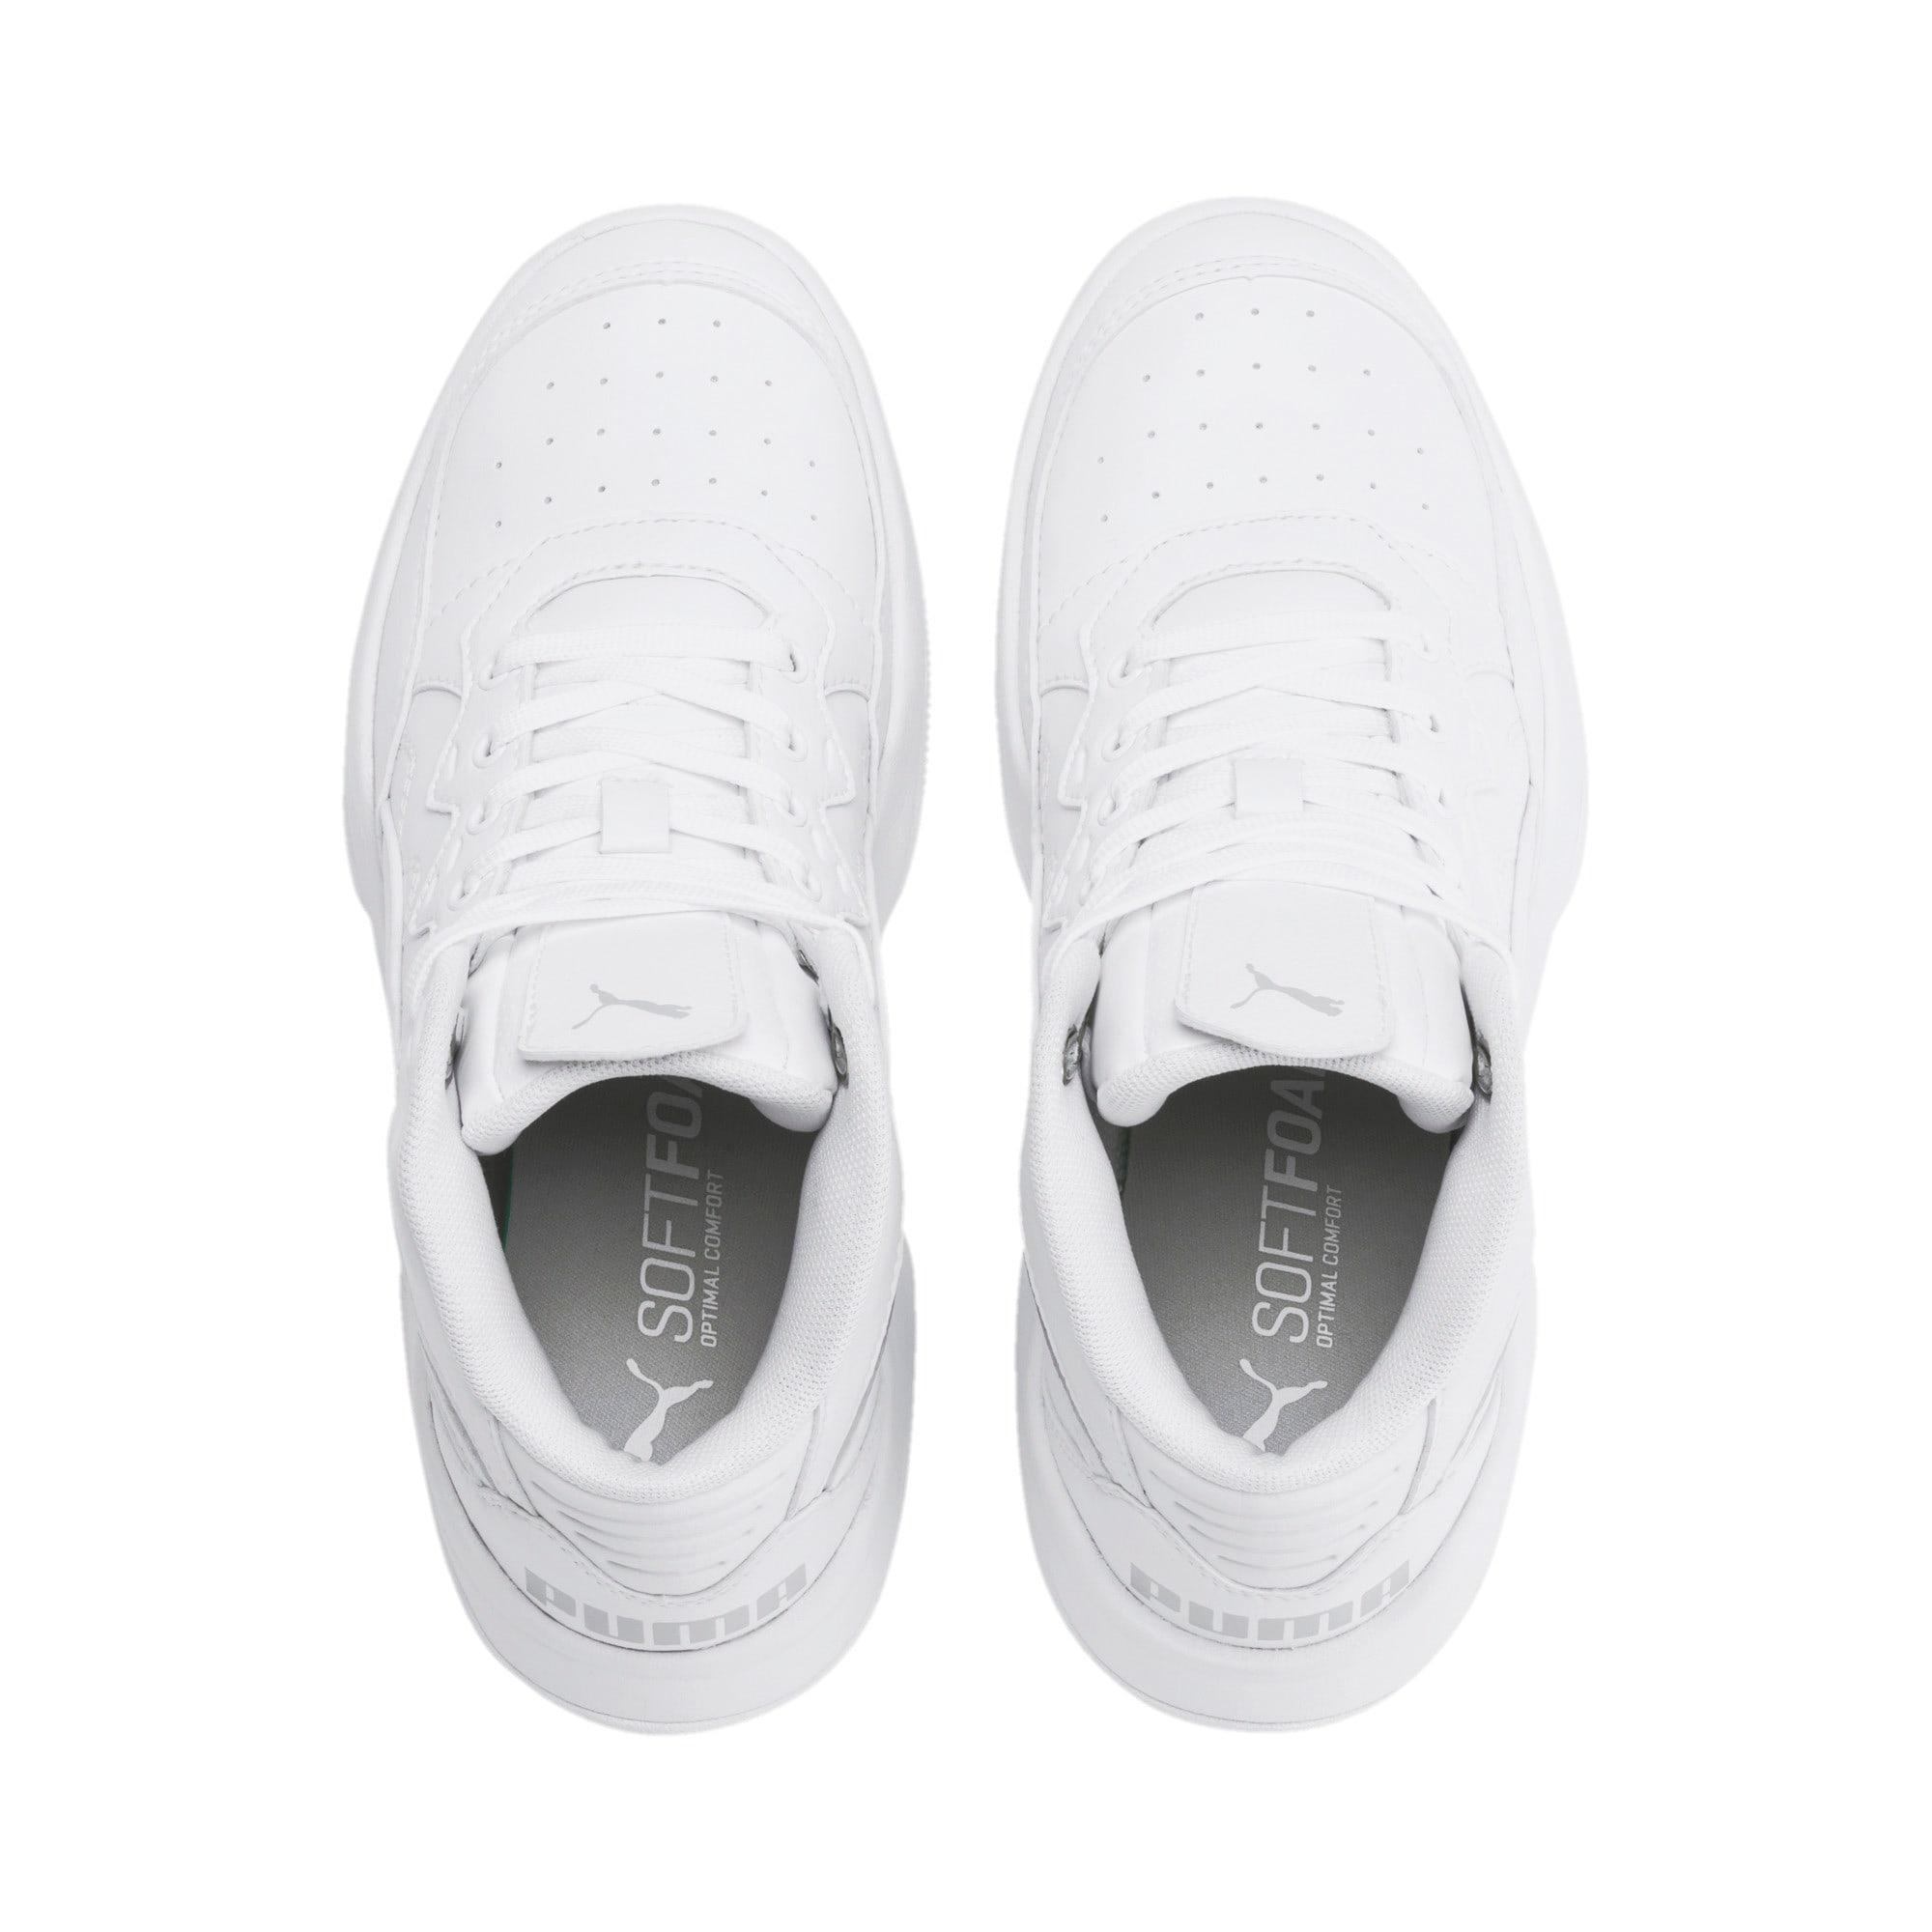 Thumbnail 6 of PUMA Rebound Playoff SL Sneakers JR, Puma White-Puma Silver, medium